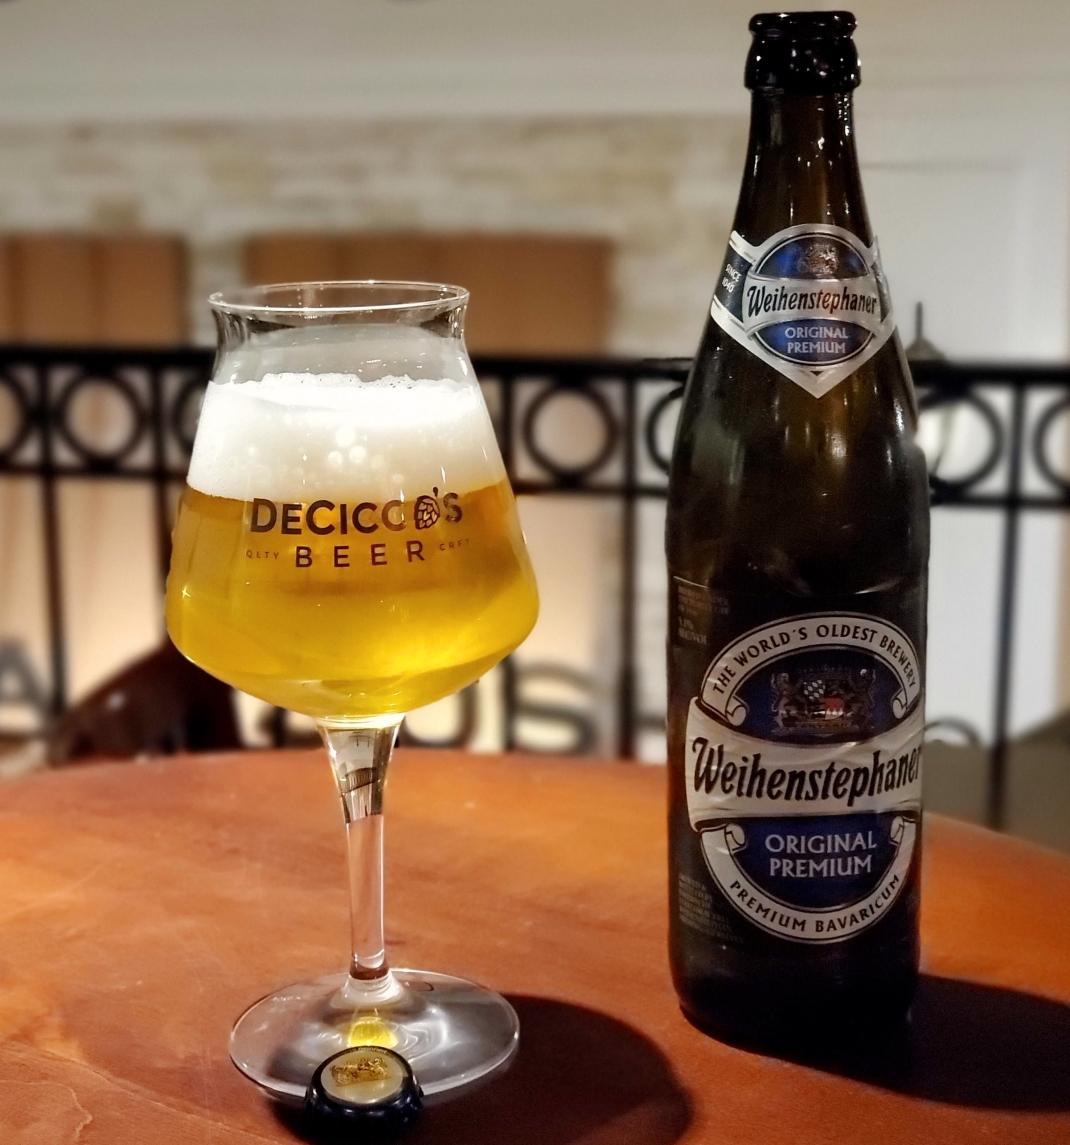 Beer 1 Old Premium